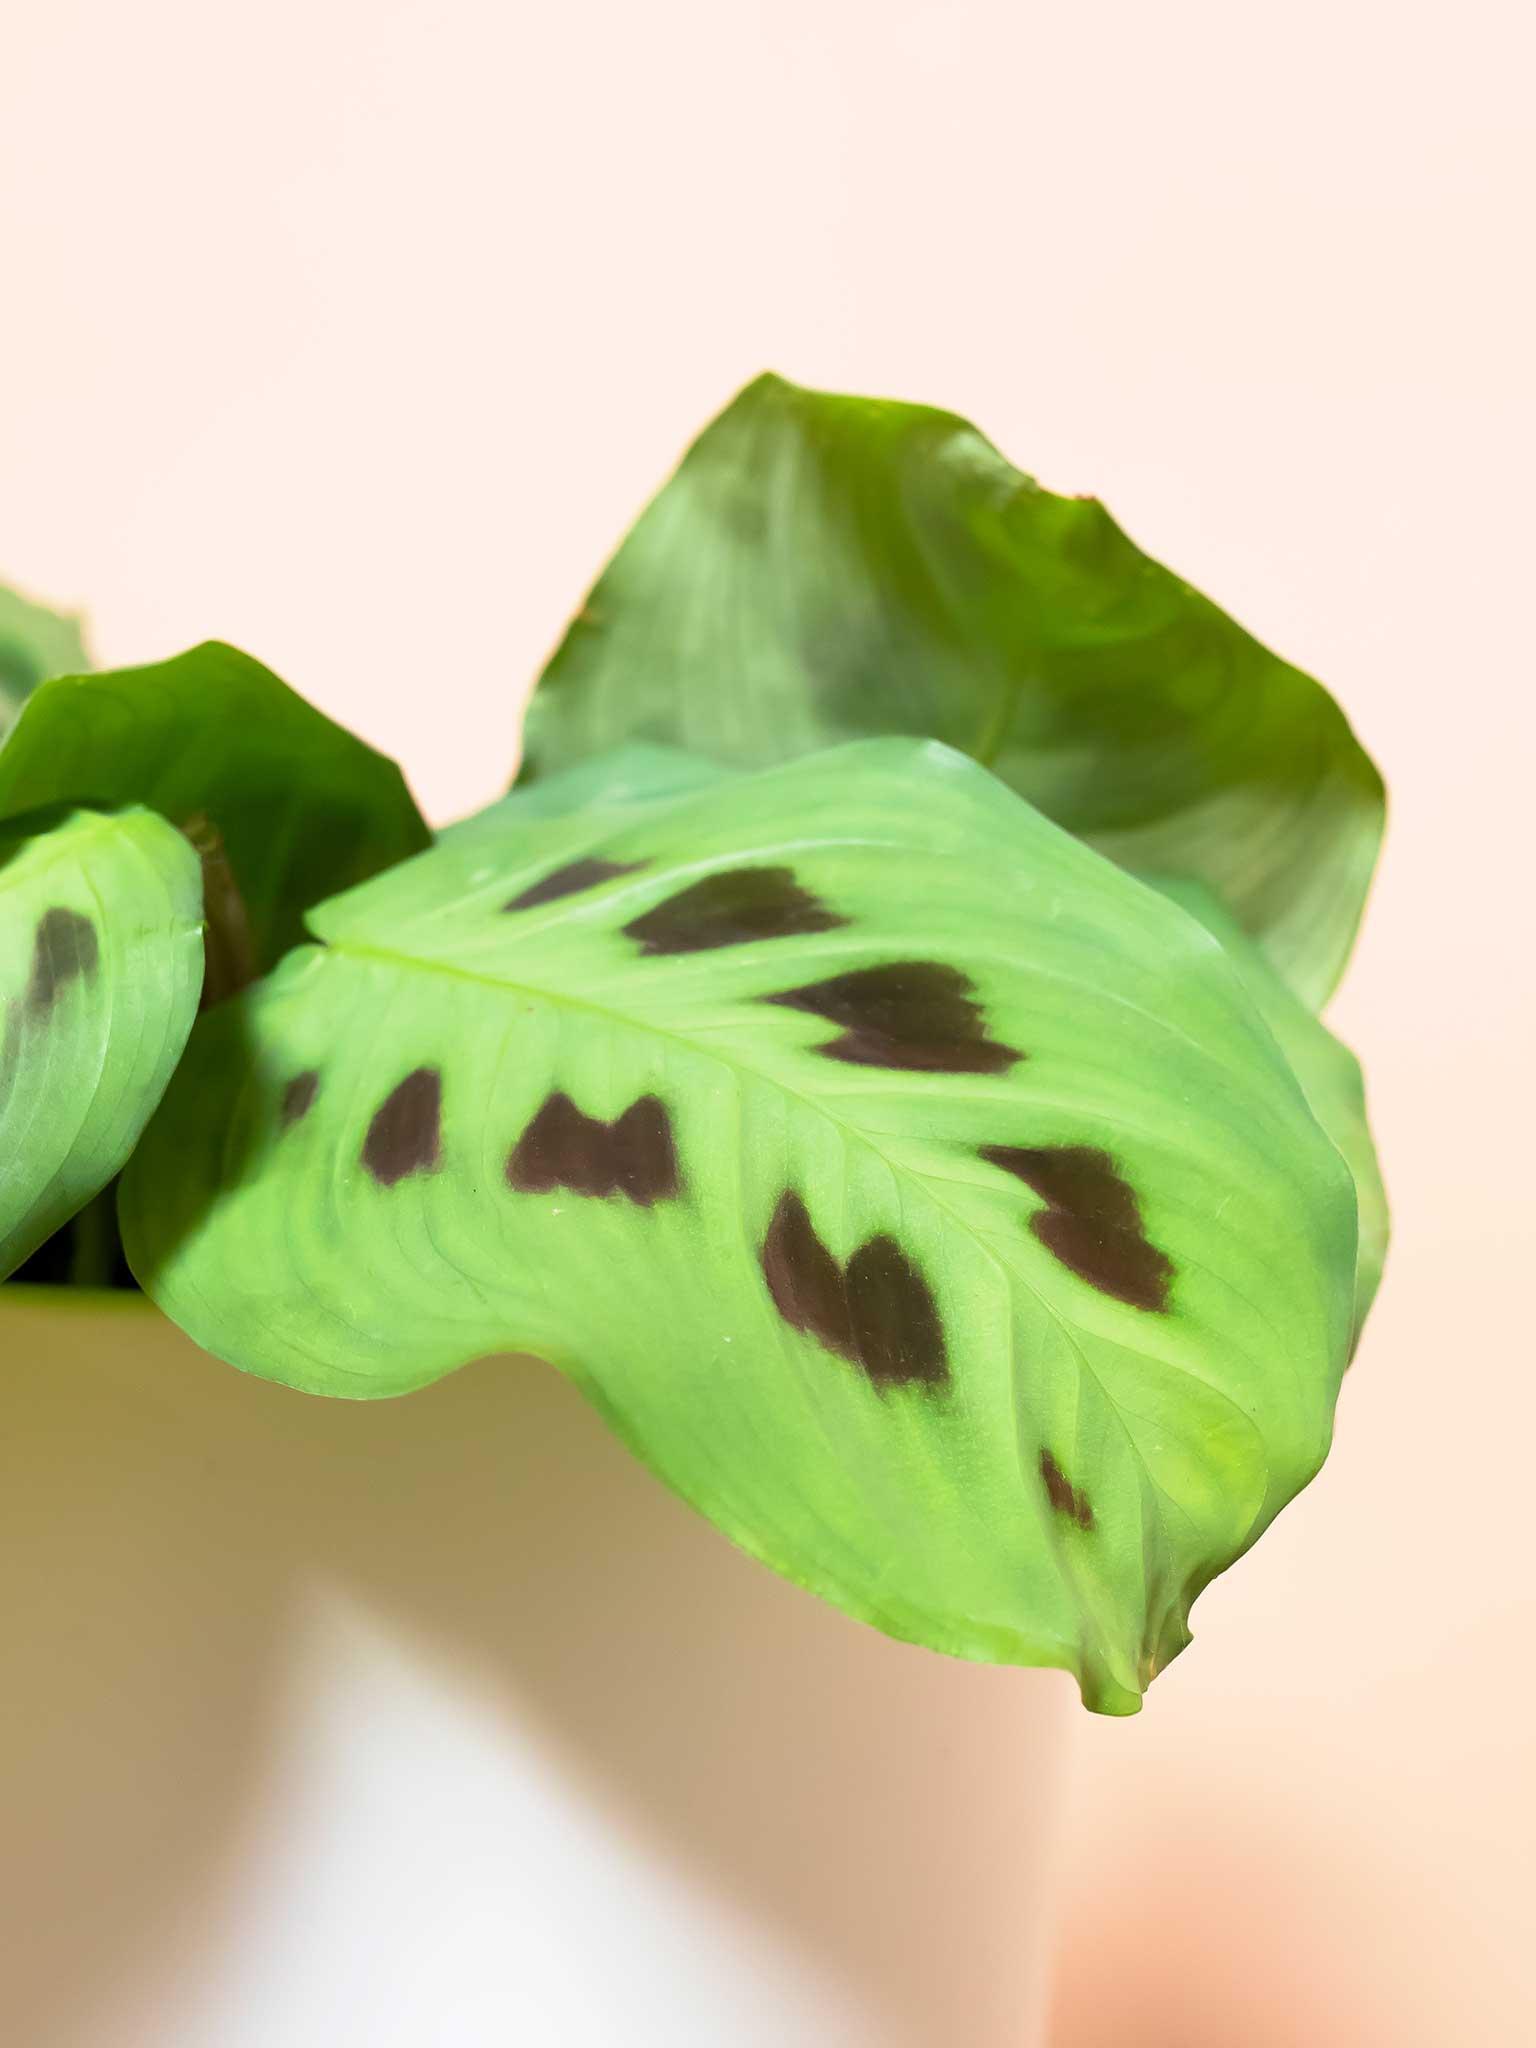 Green prayer plant leaf